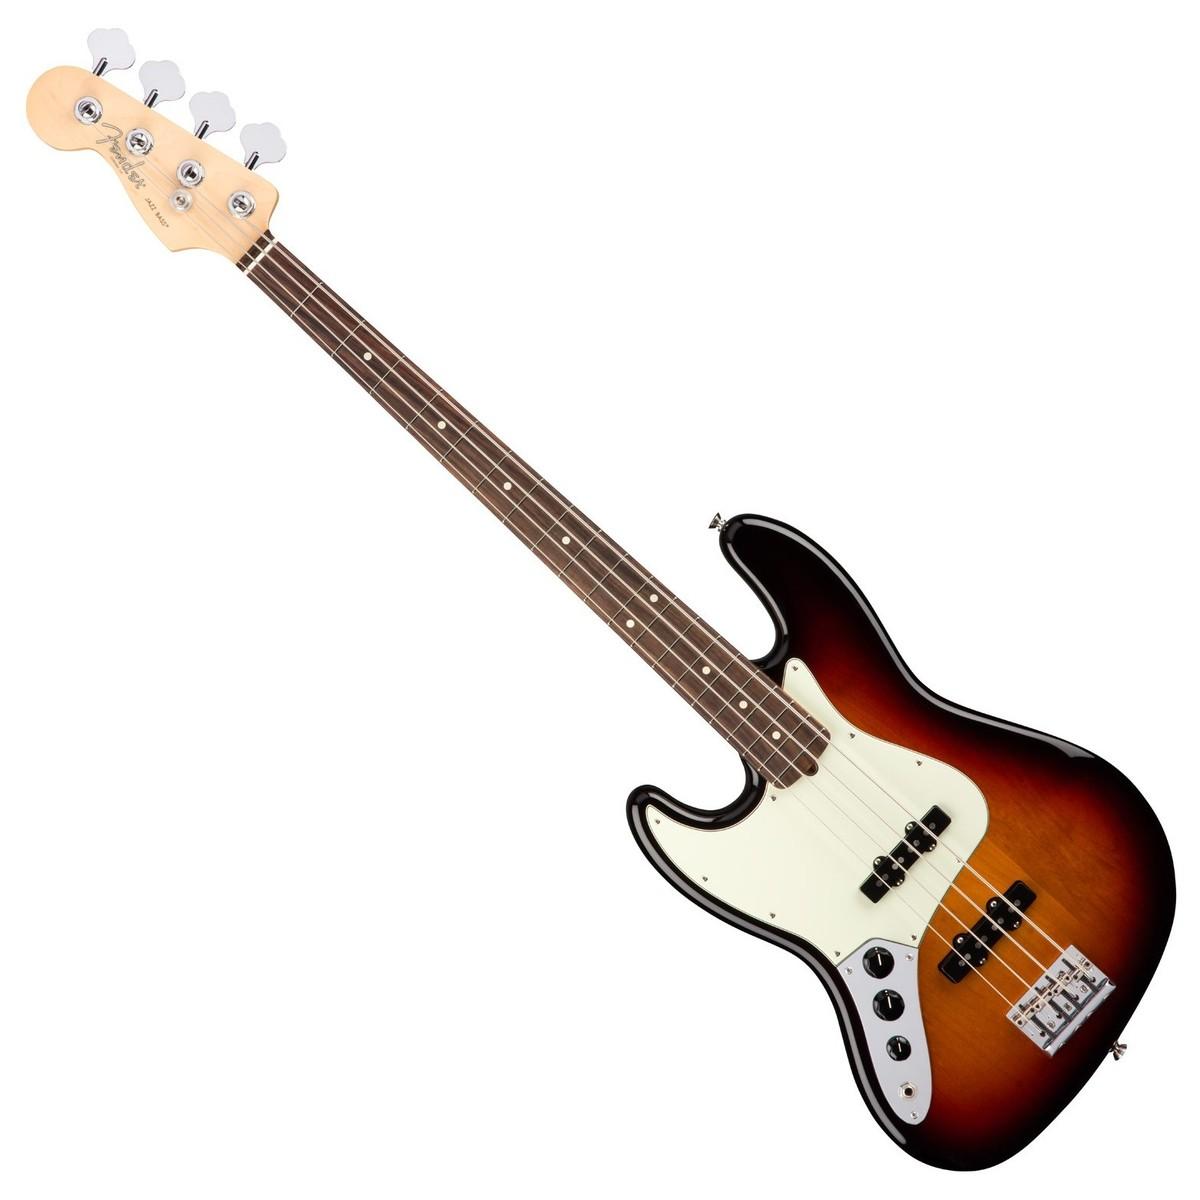 fender american pro jazz bass left handed rw 3 tone sunburst at gear4music. Black Bedroom Furniture Sets. Home Design Ideas